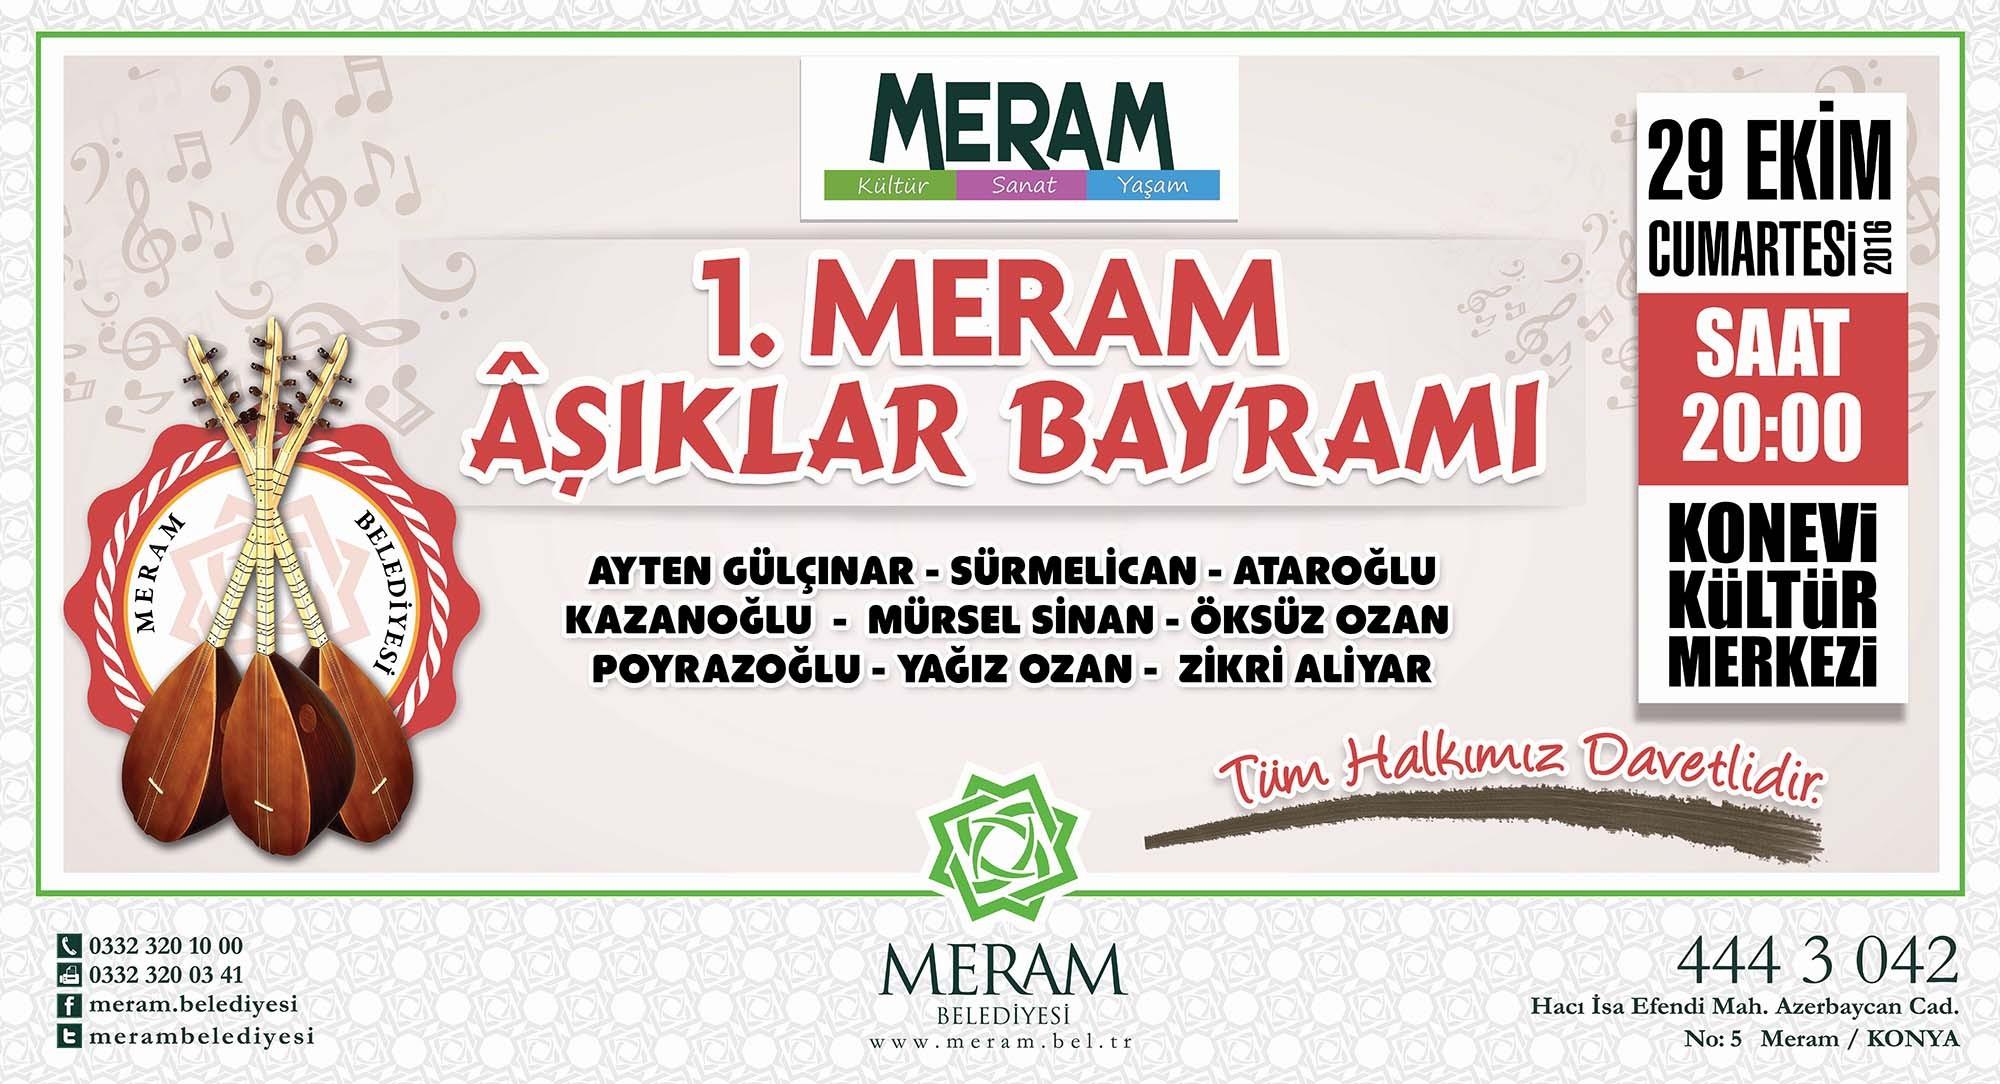 MERAM'DA AŞIKLAR BAYRAMI